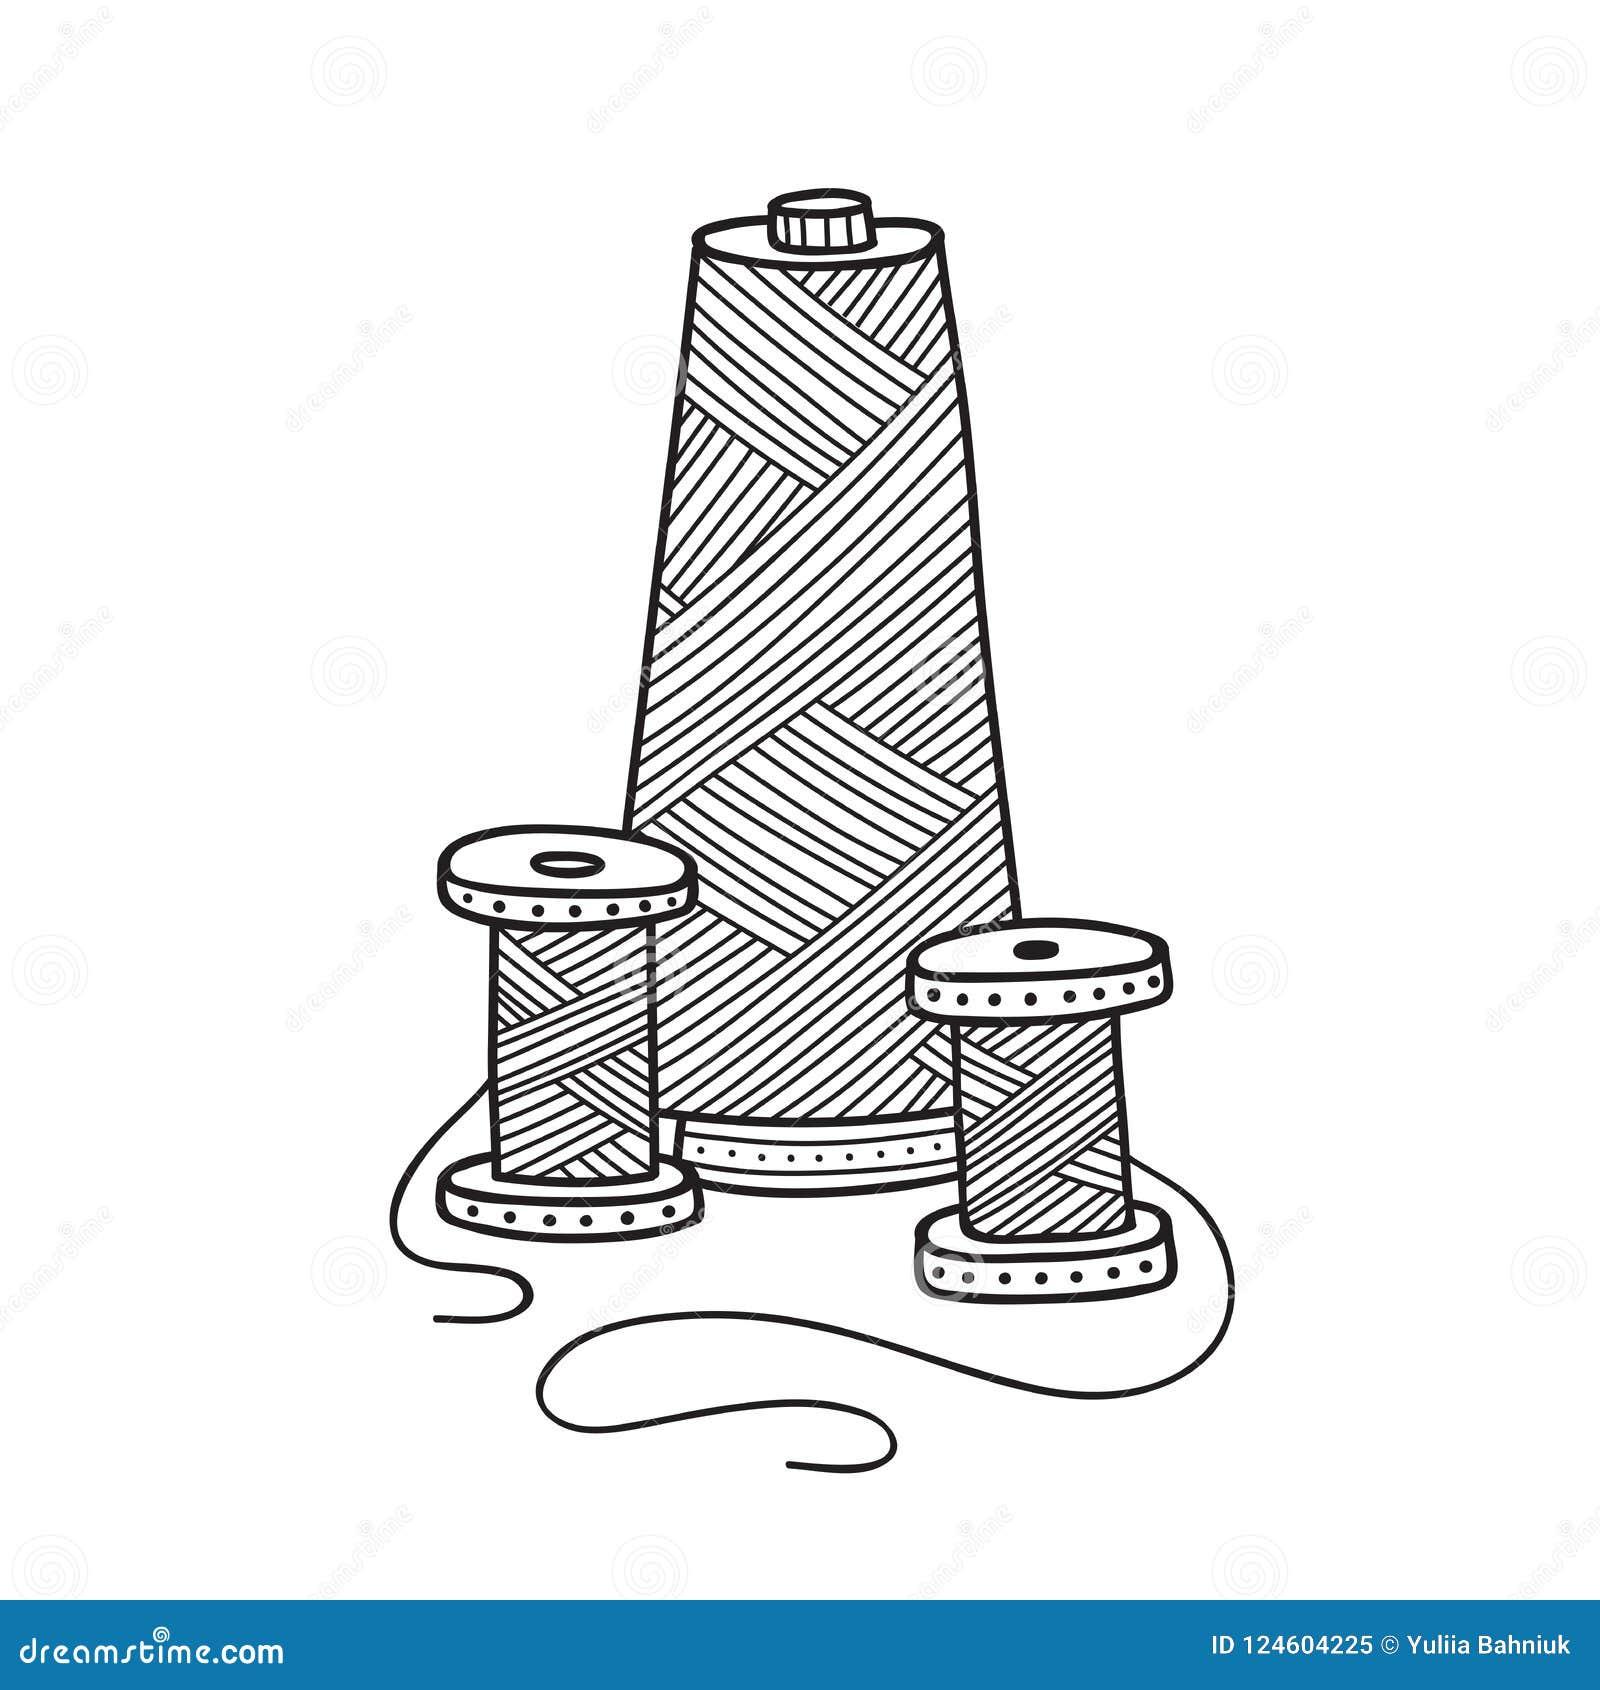 Vector Illustration Of Spool Of Thread. Stock Vector - Illustration ...